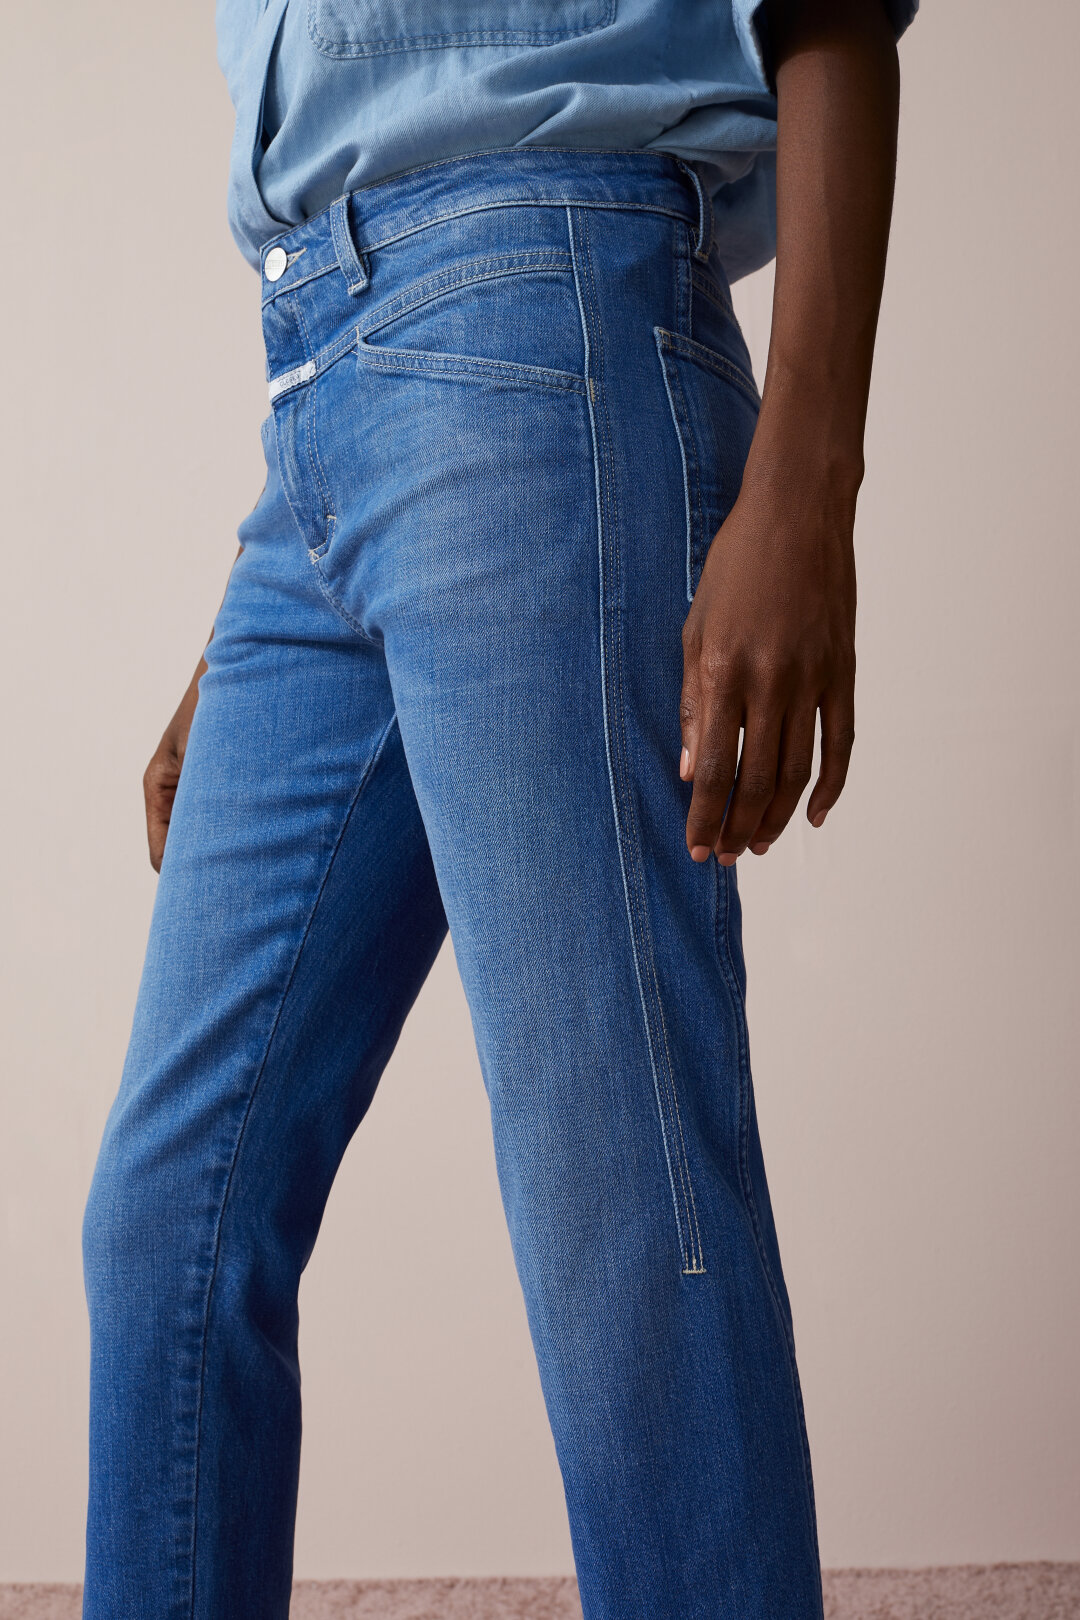 NEU Kurzgröße Damen Stretch Jeans Hose hell blau Blumen Stickerei Gr 31 62